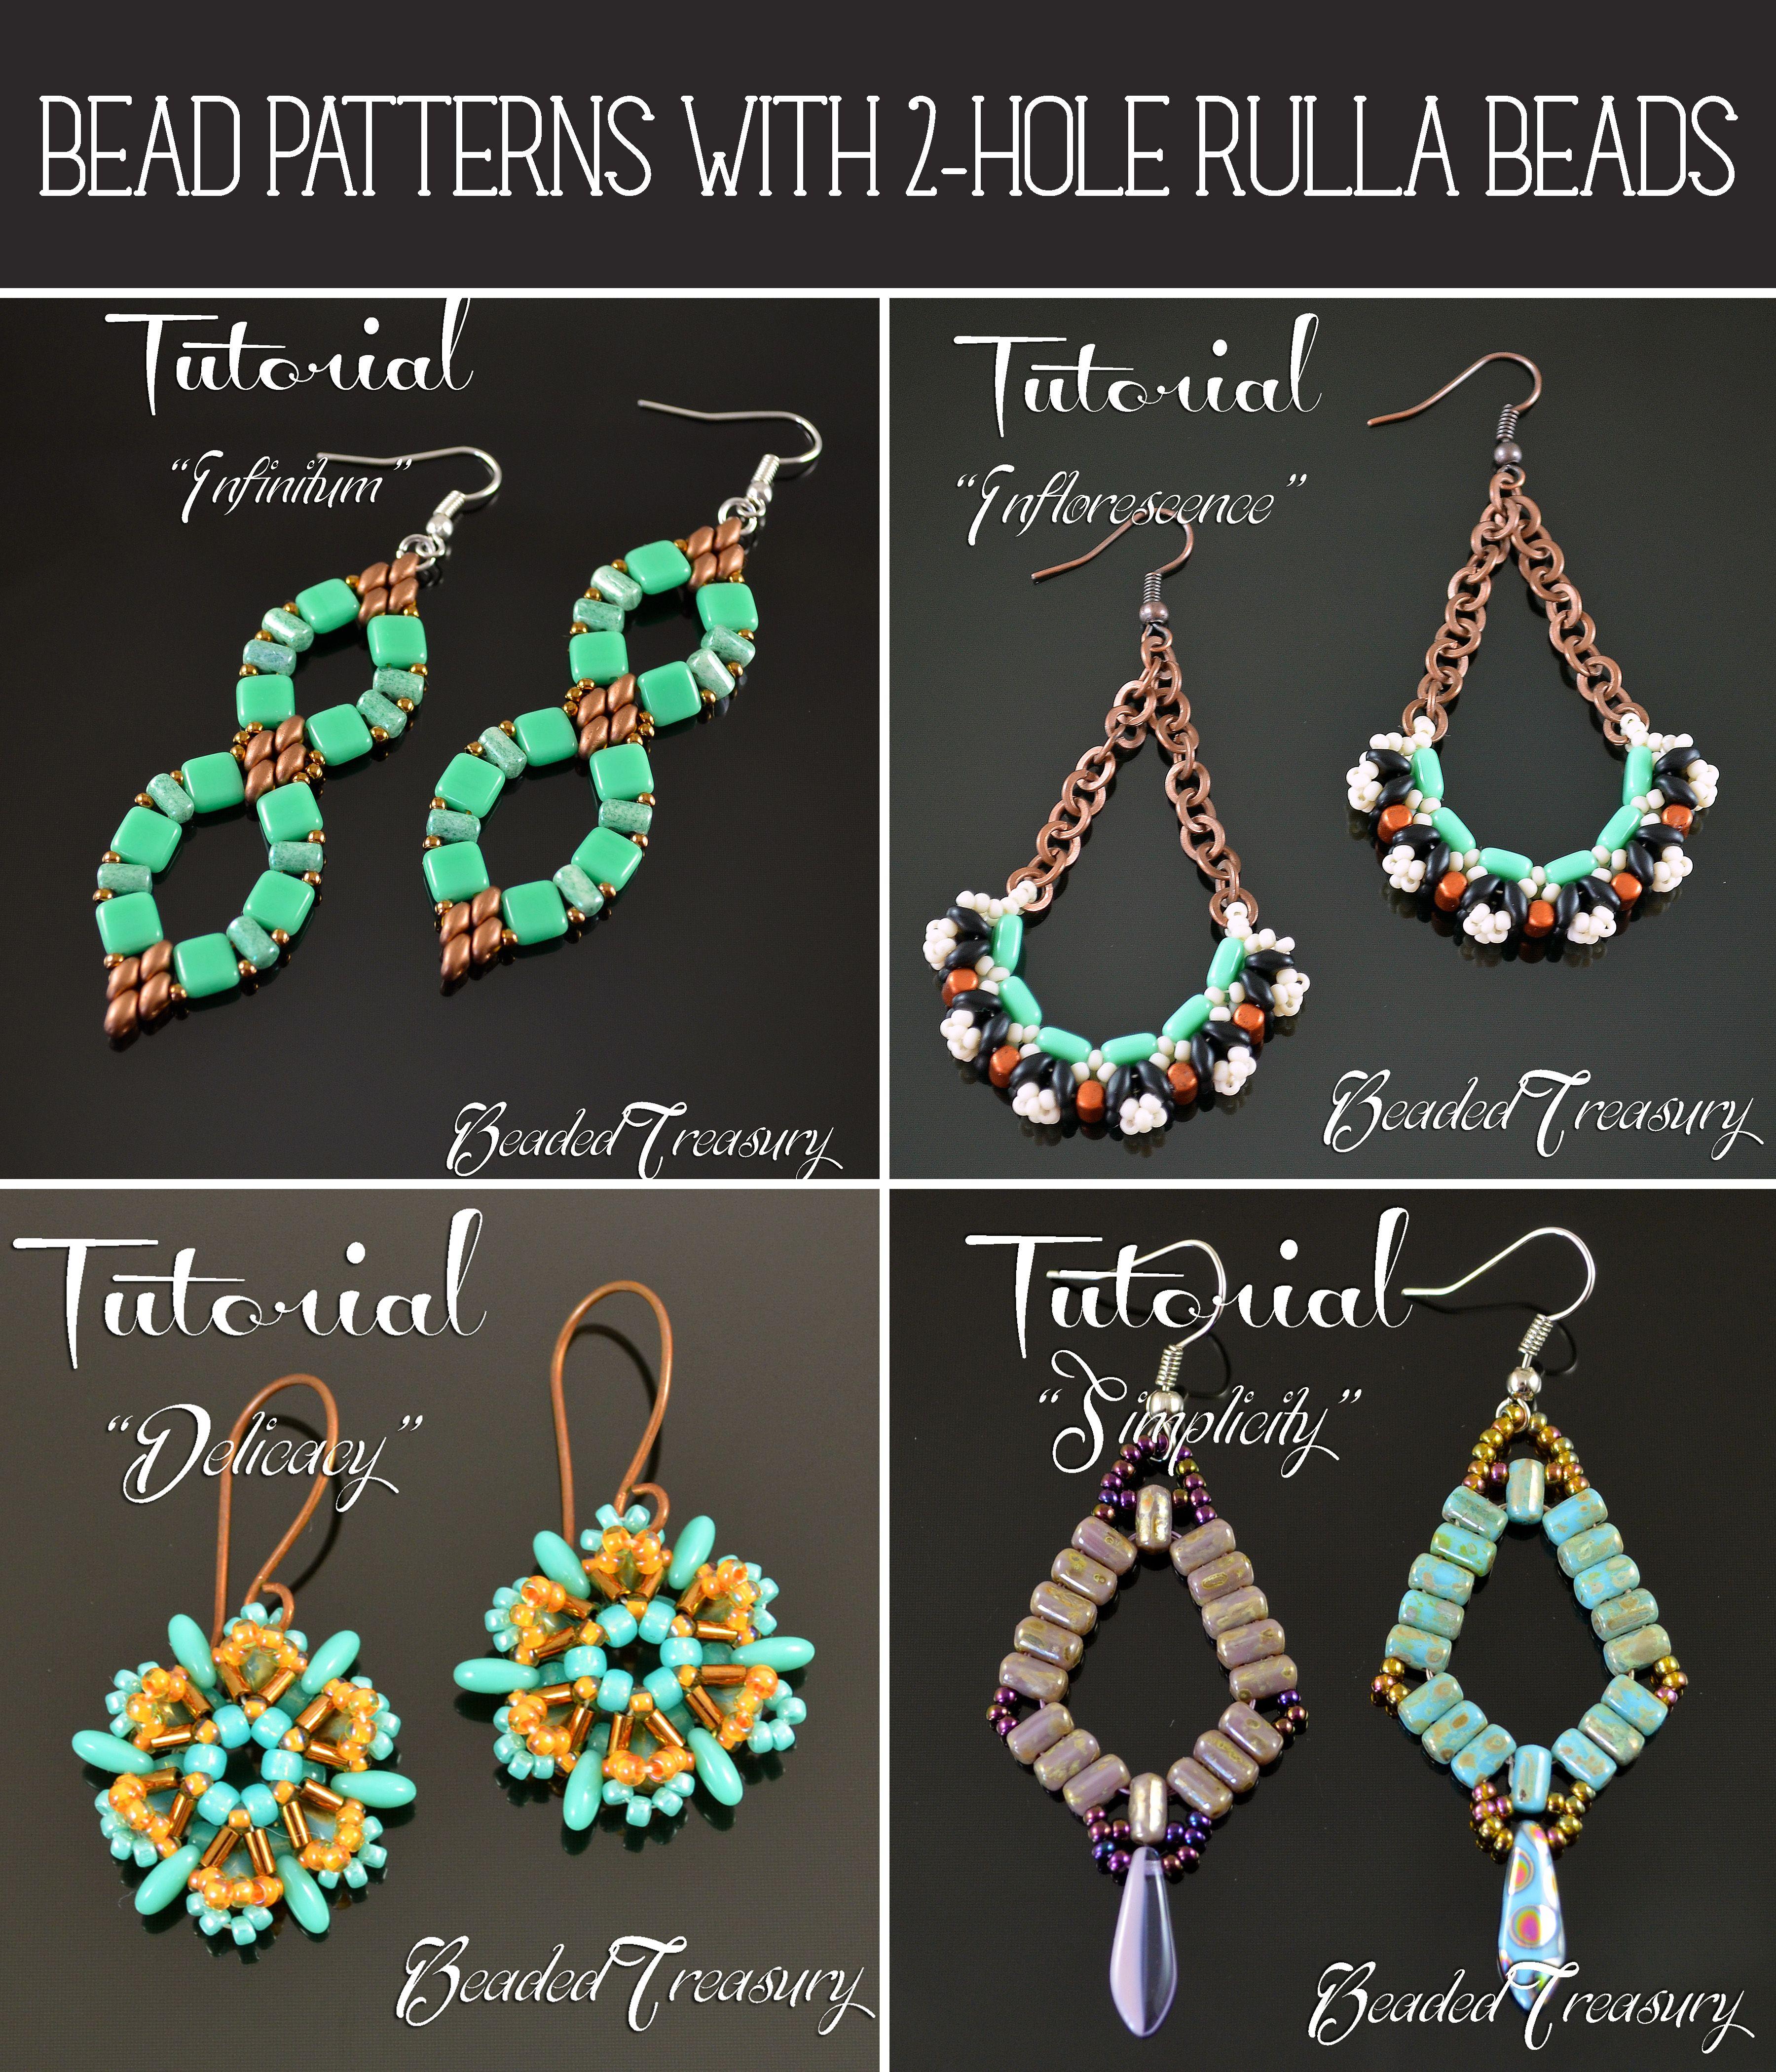 Beadwoven earrings tutorials by BeadedTreasury.